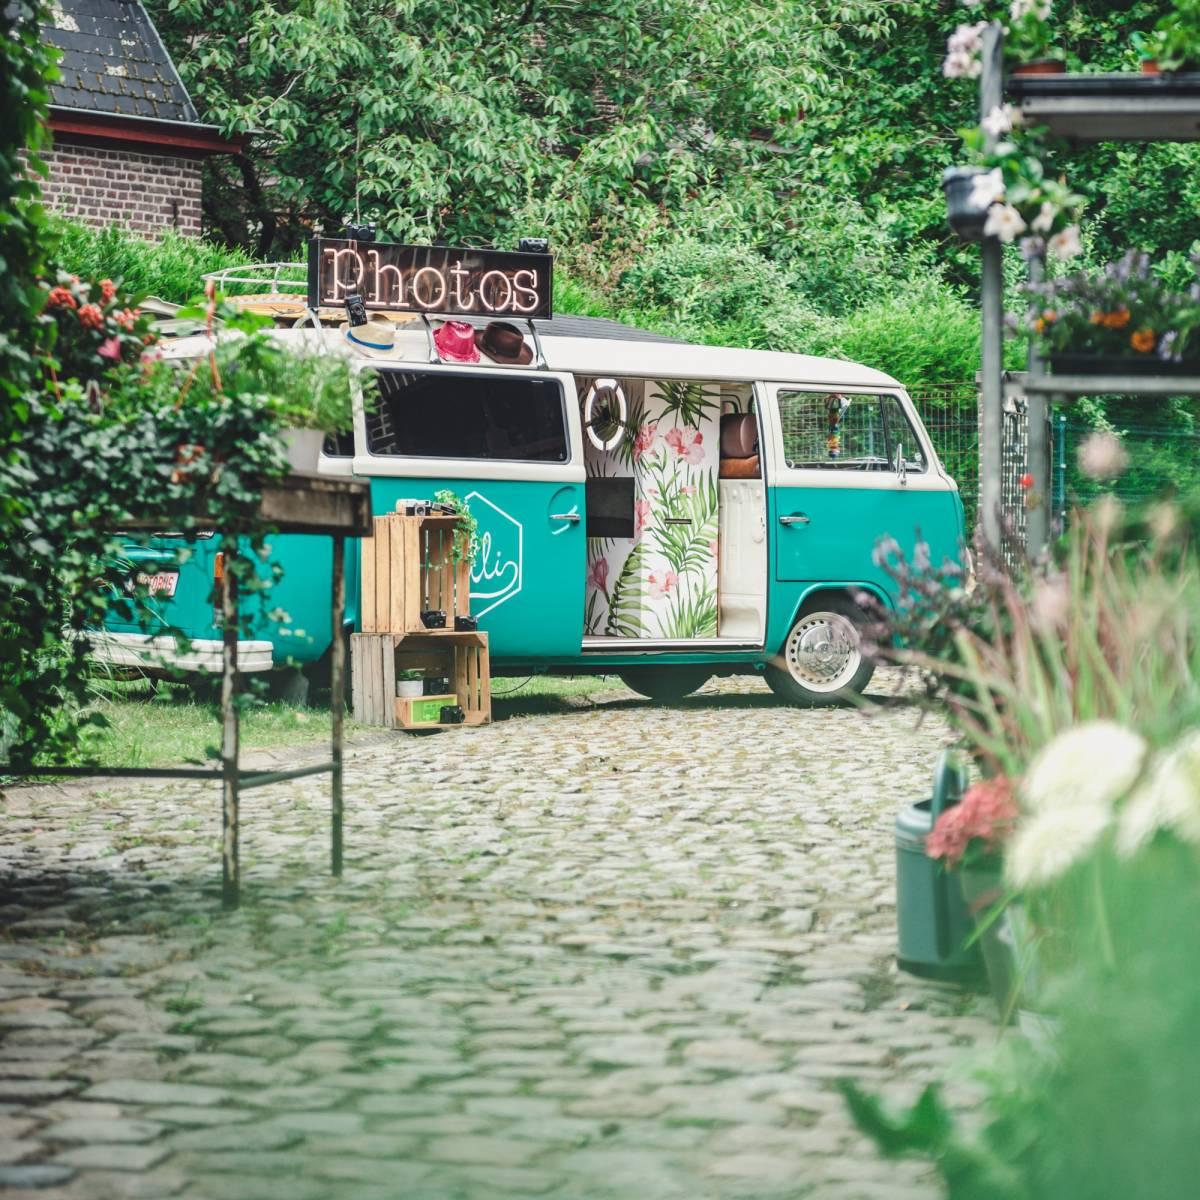 Bulli - Photobooth - House of Weddings (3)